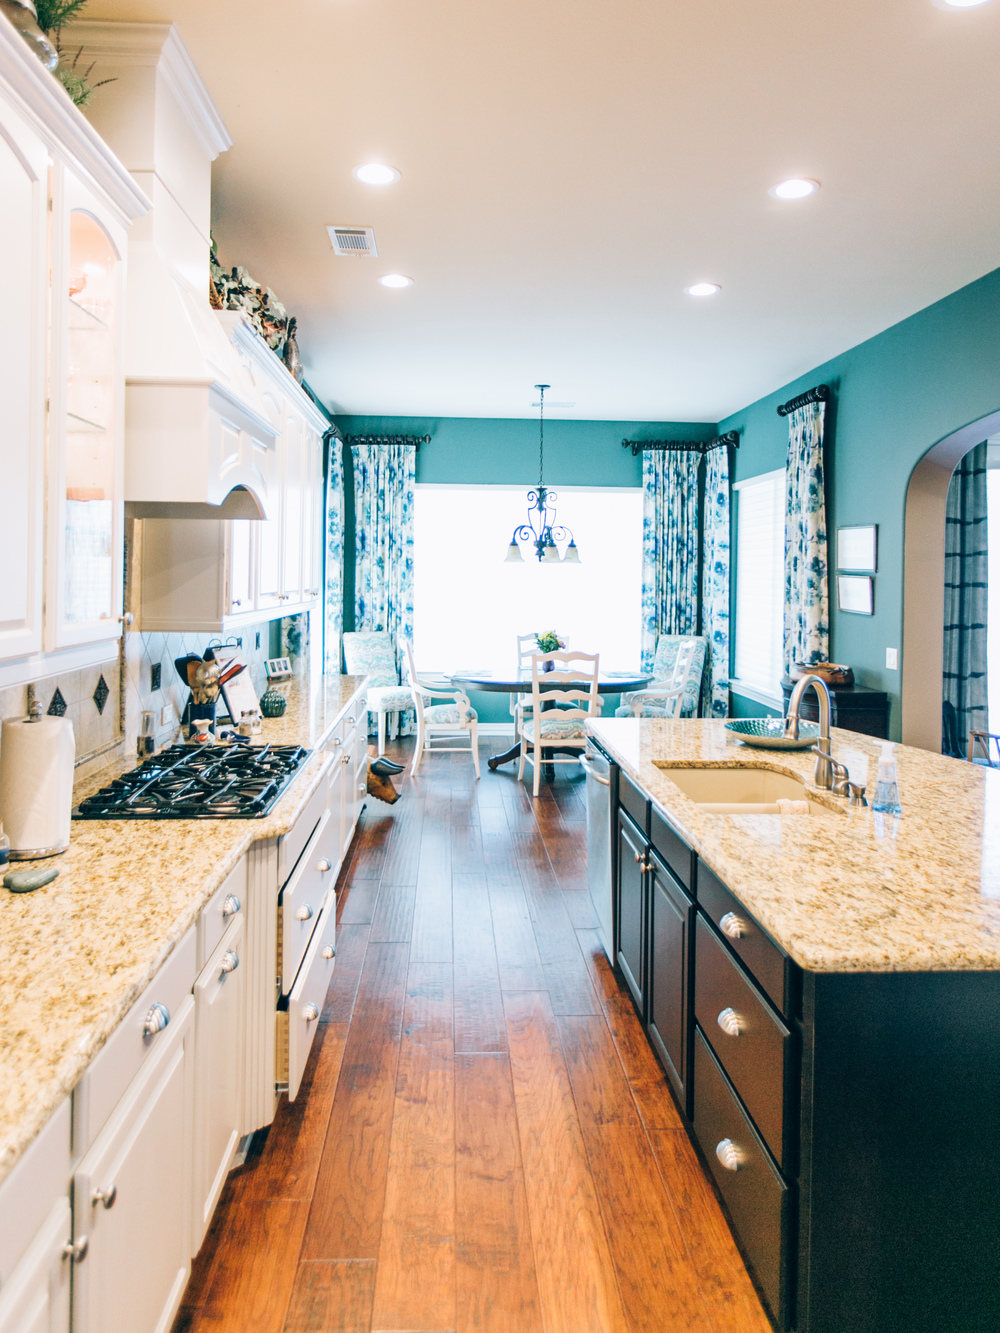 Interior-design-home-decorating-283.jpg